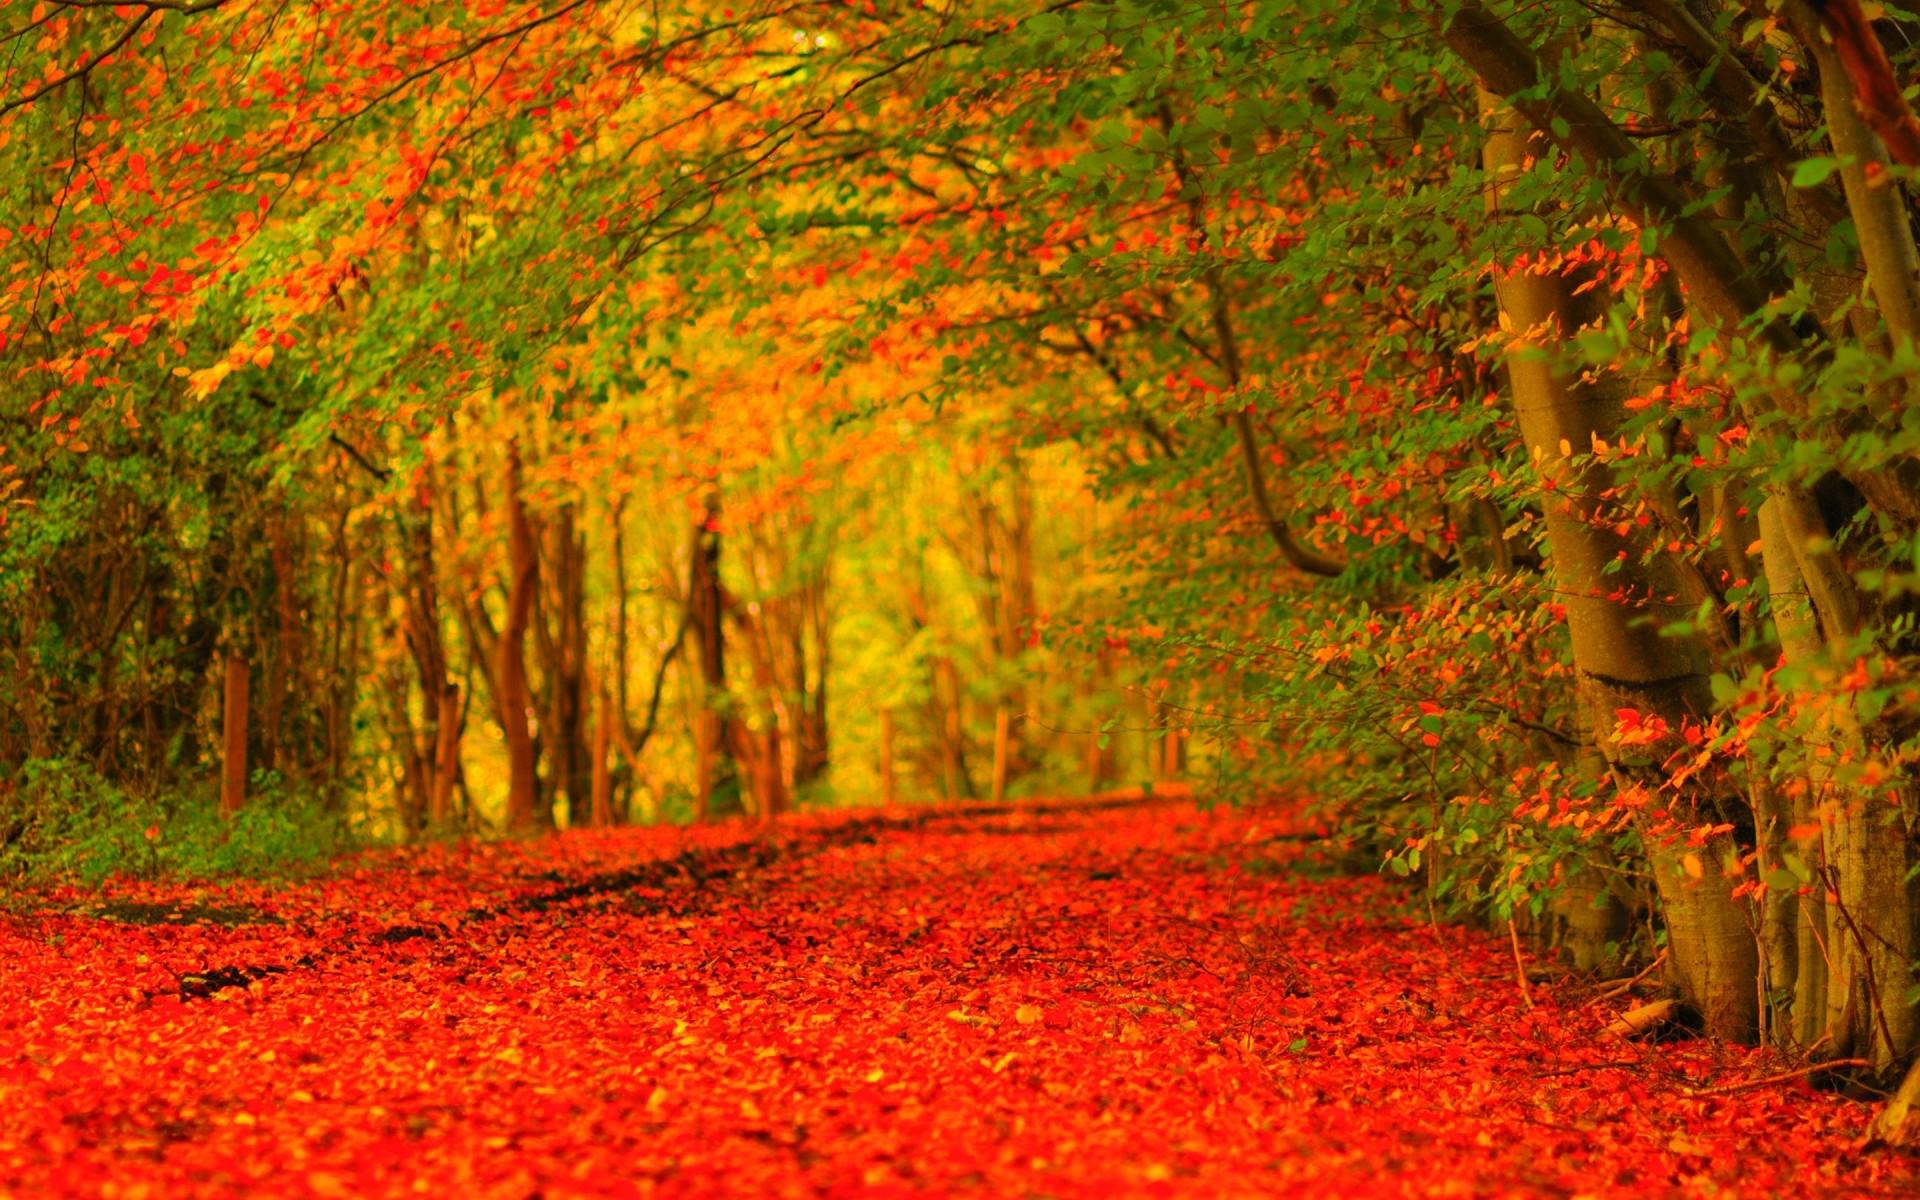 Autumn wallpaper Widescreen ·① Download free amazing High ...